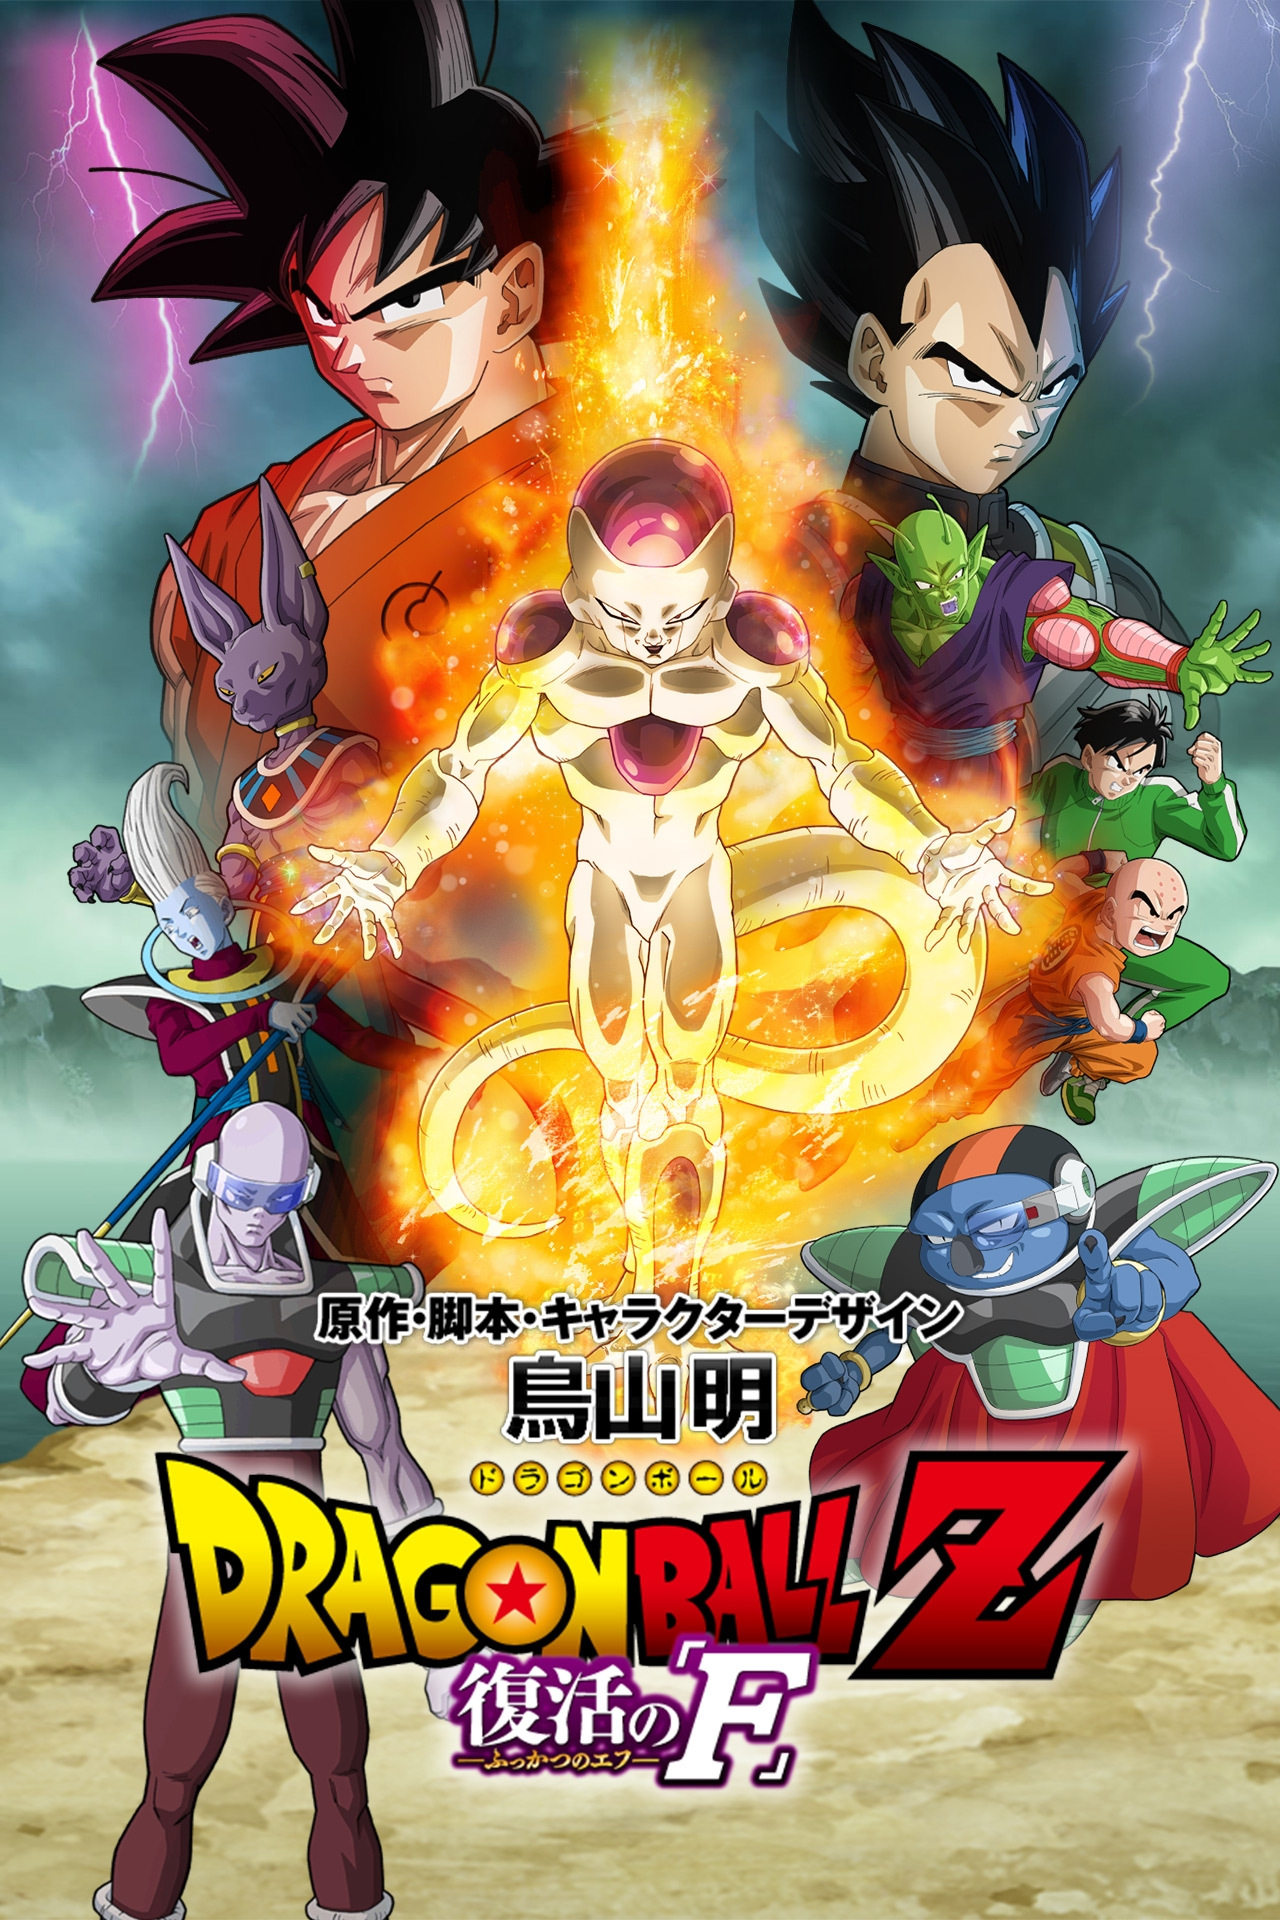 dragon ball revival of f